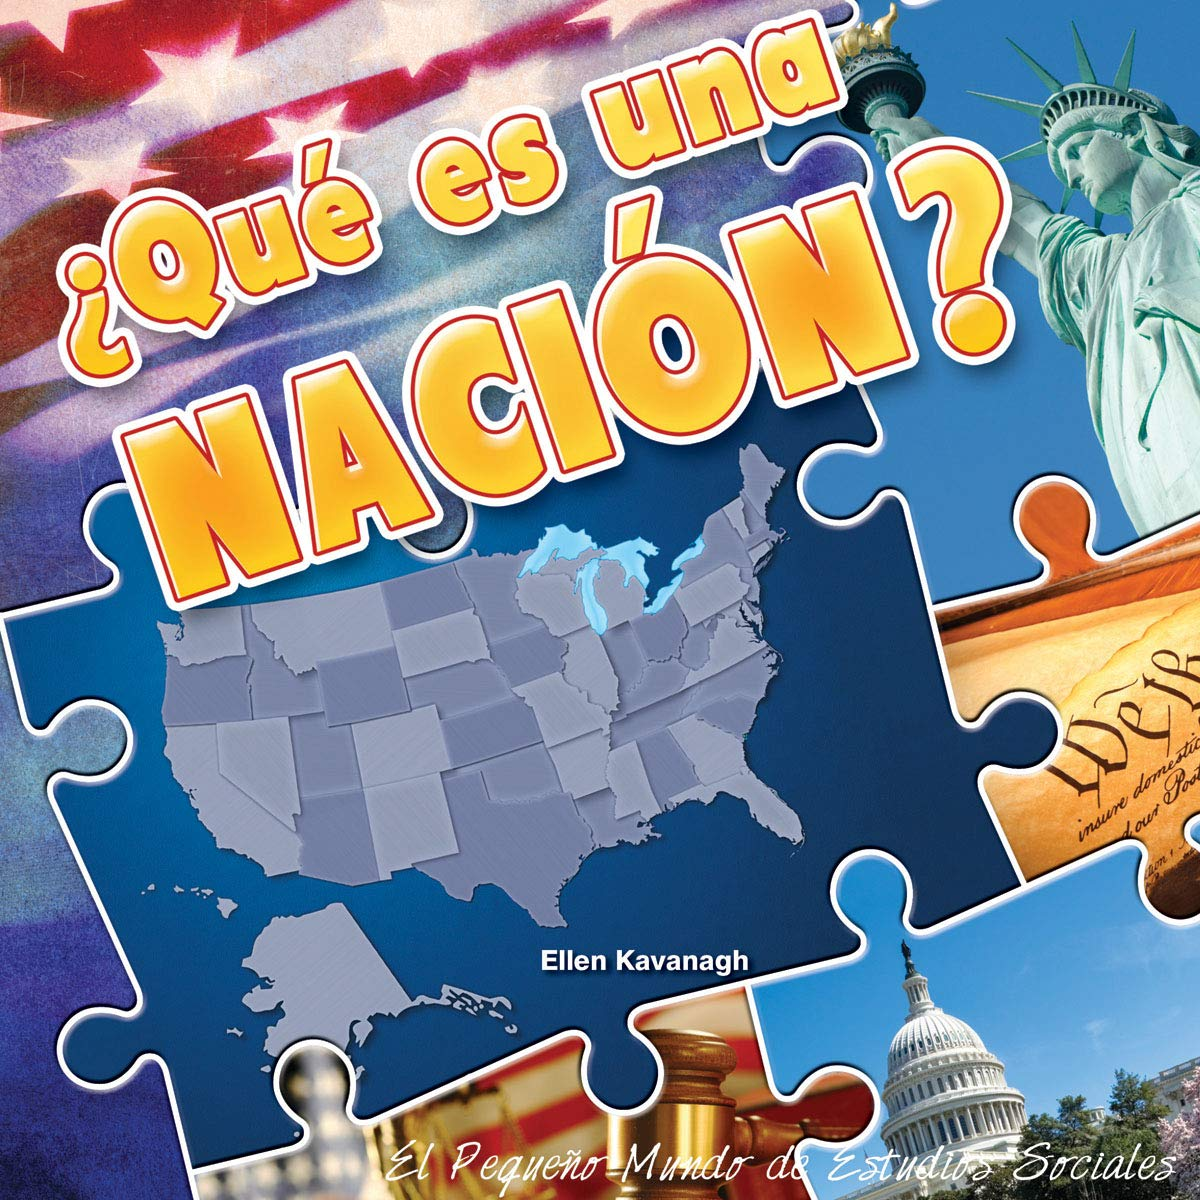 Read Online Qué es una nación?: What Is A Nation? (Little World Social Studies) pdf epub